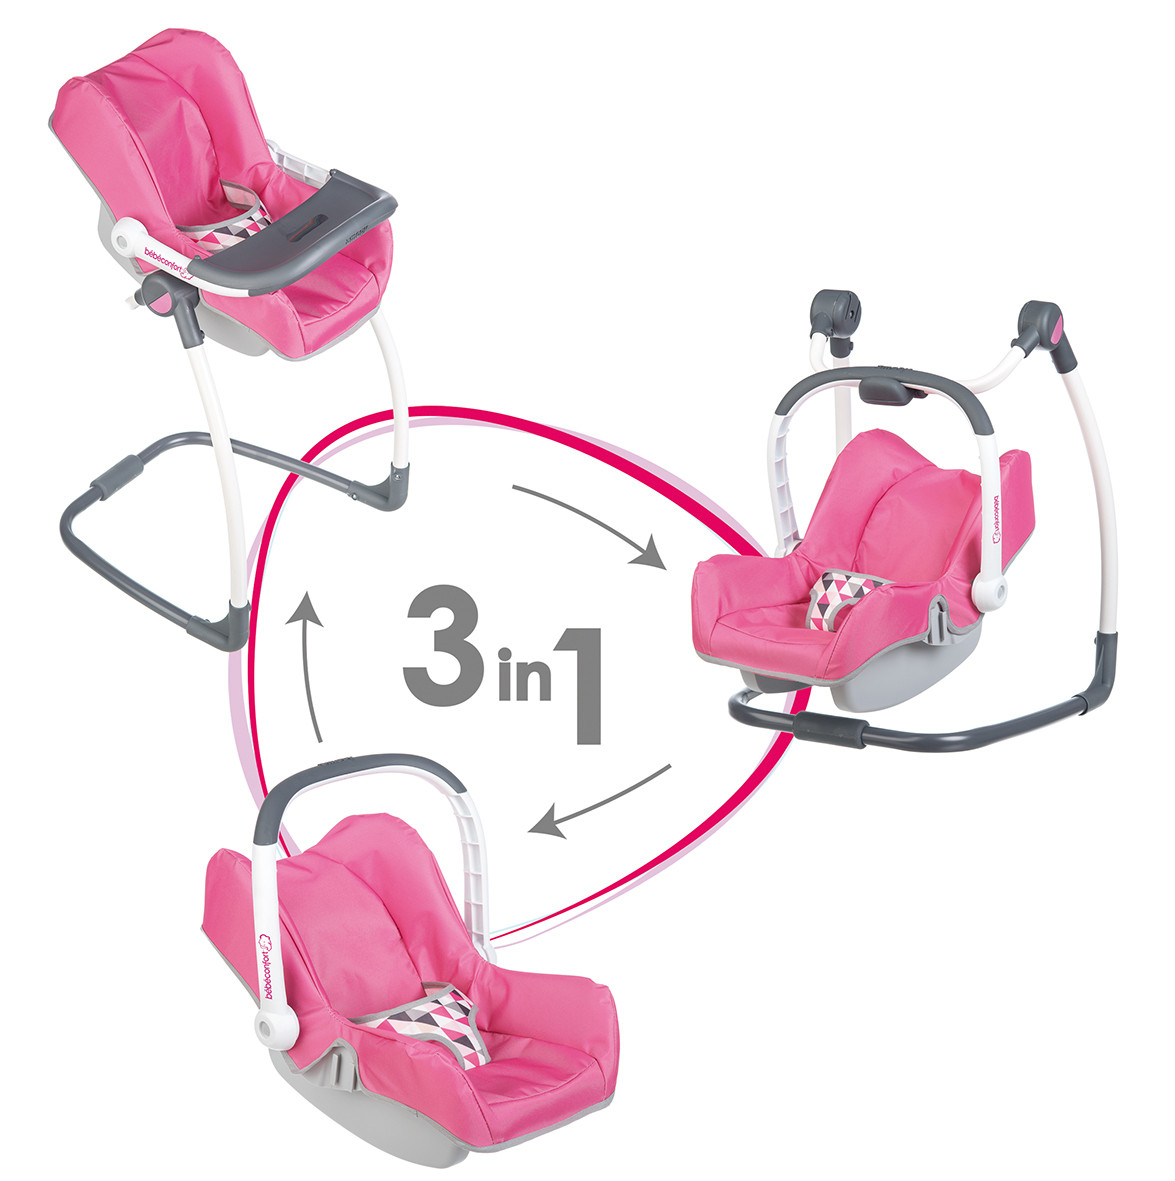 chaise haute smoby 3 en 1